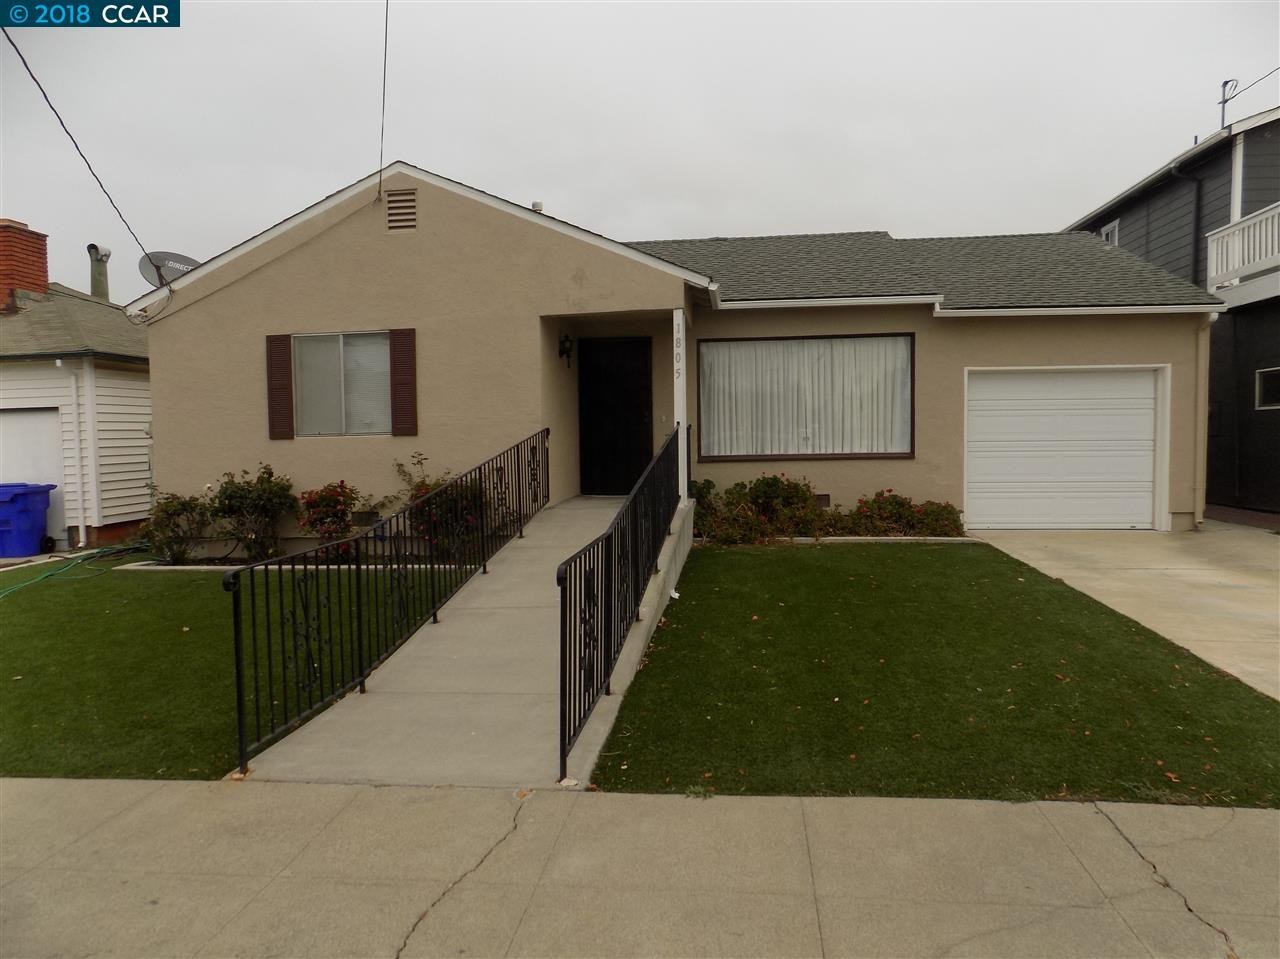 1805 OHIO, RICHMOND, CA 94804